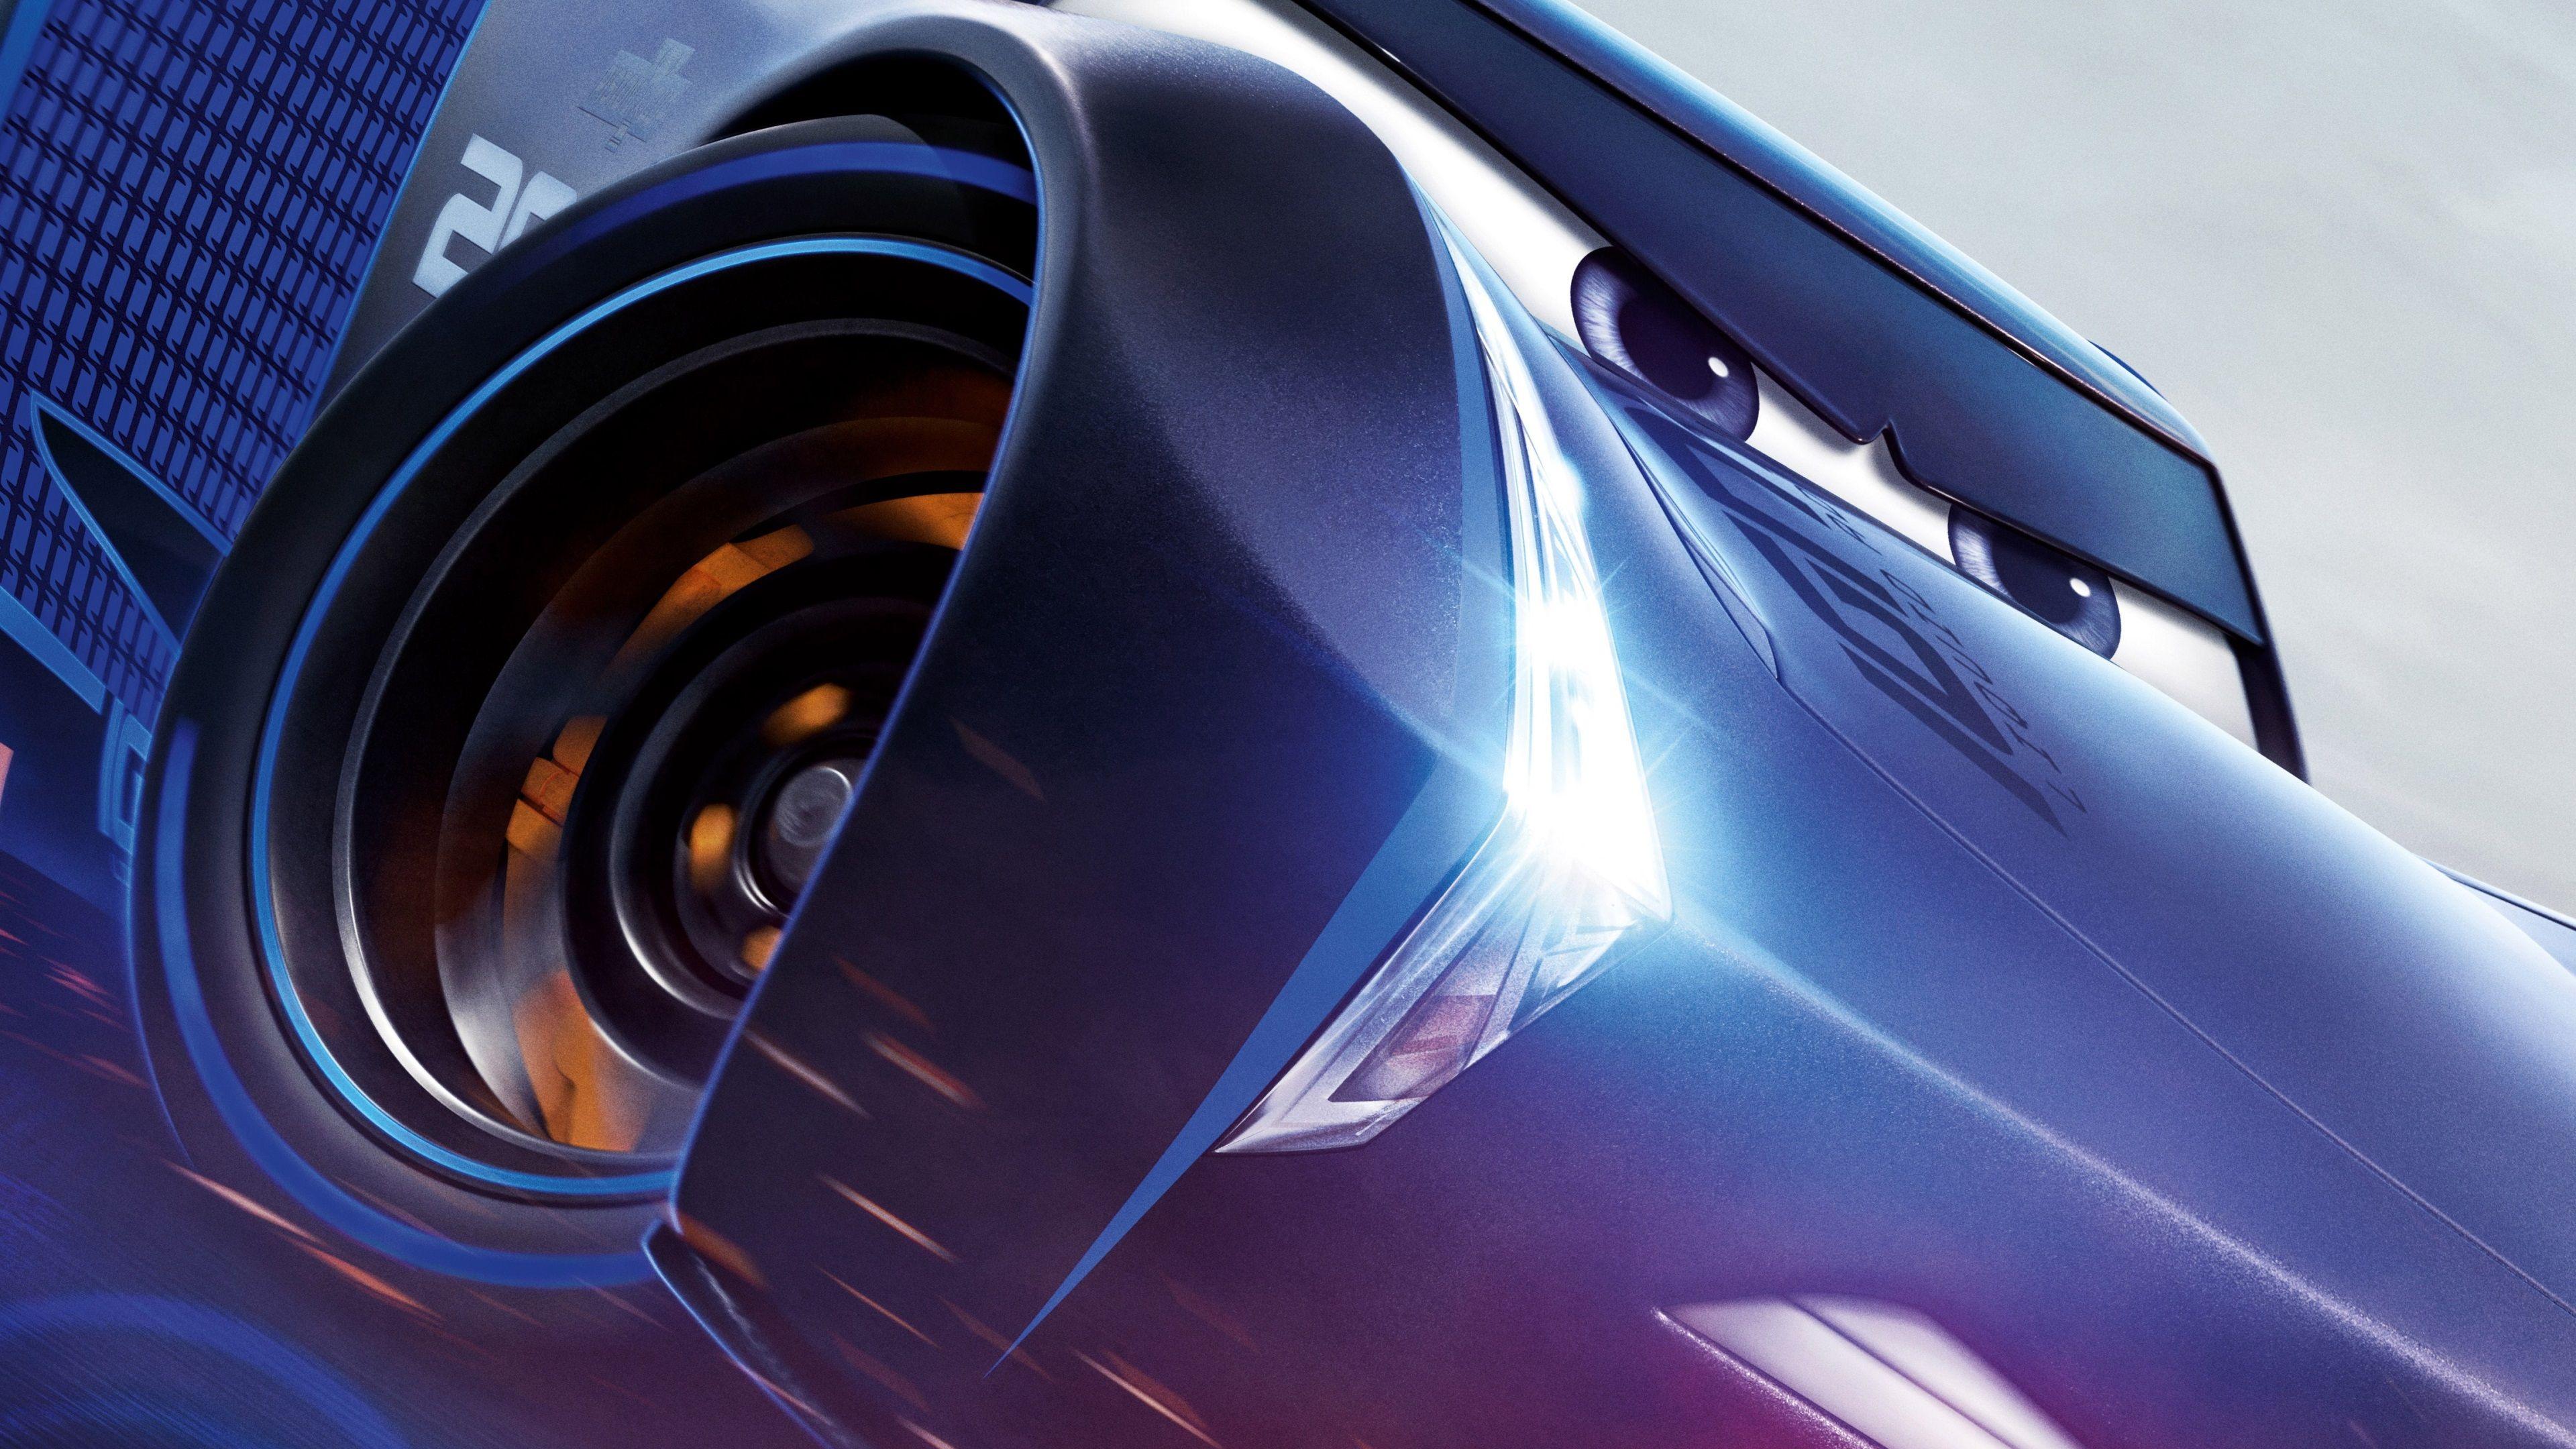 3840x2160 Cars 3 4k Backgrounds For Desktop Hd Backgrounds